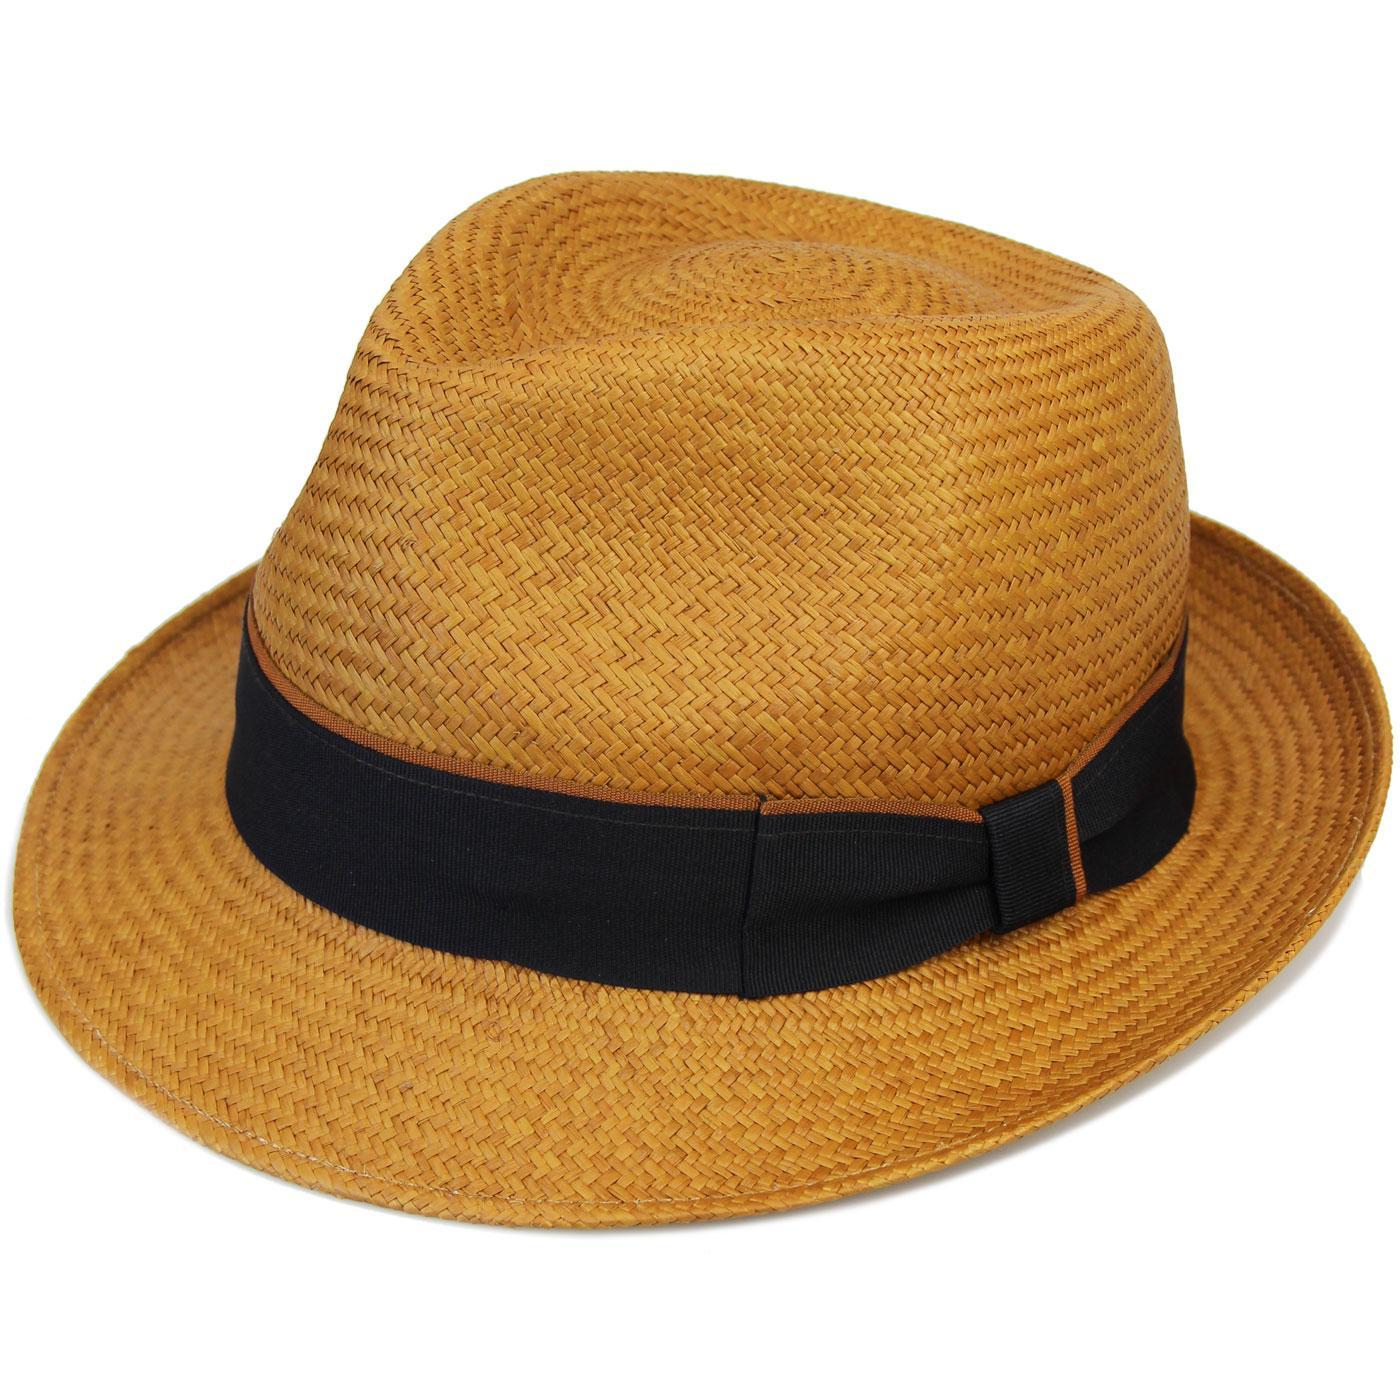 FAILSWORTH Retro Mod Contrast Stripe Panama Hat M